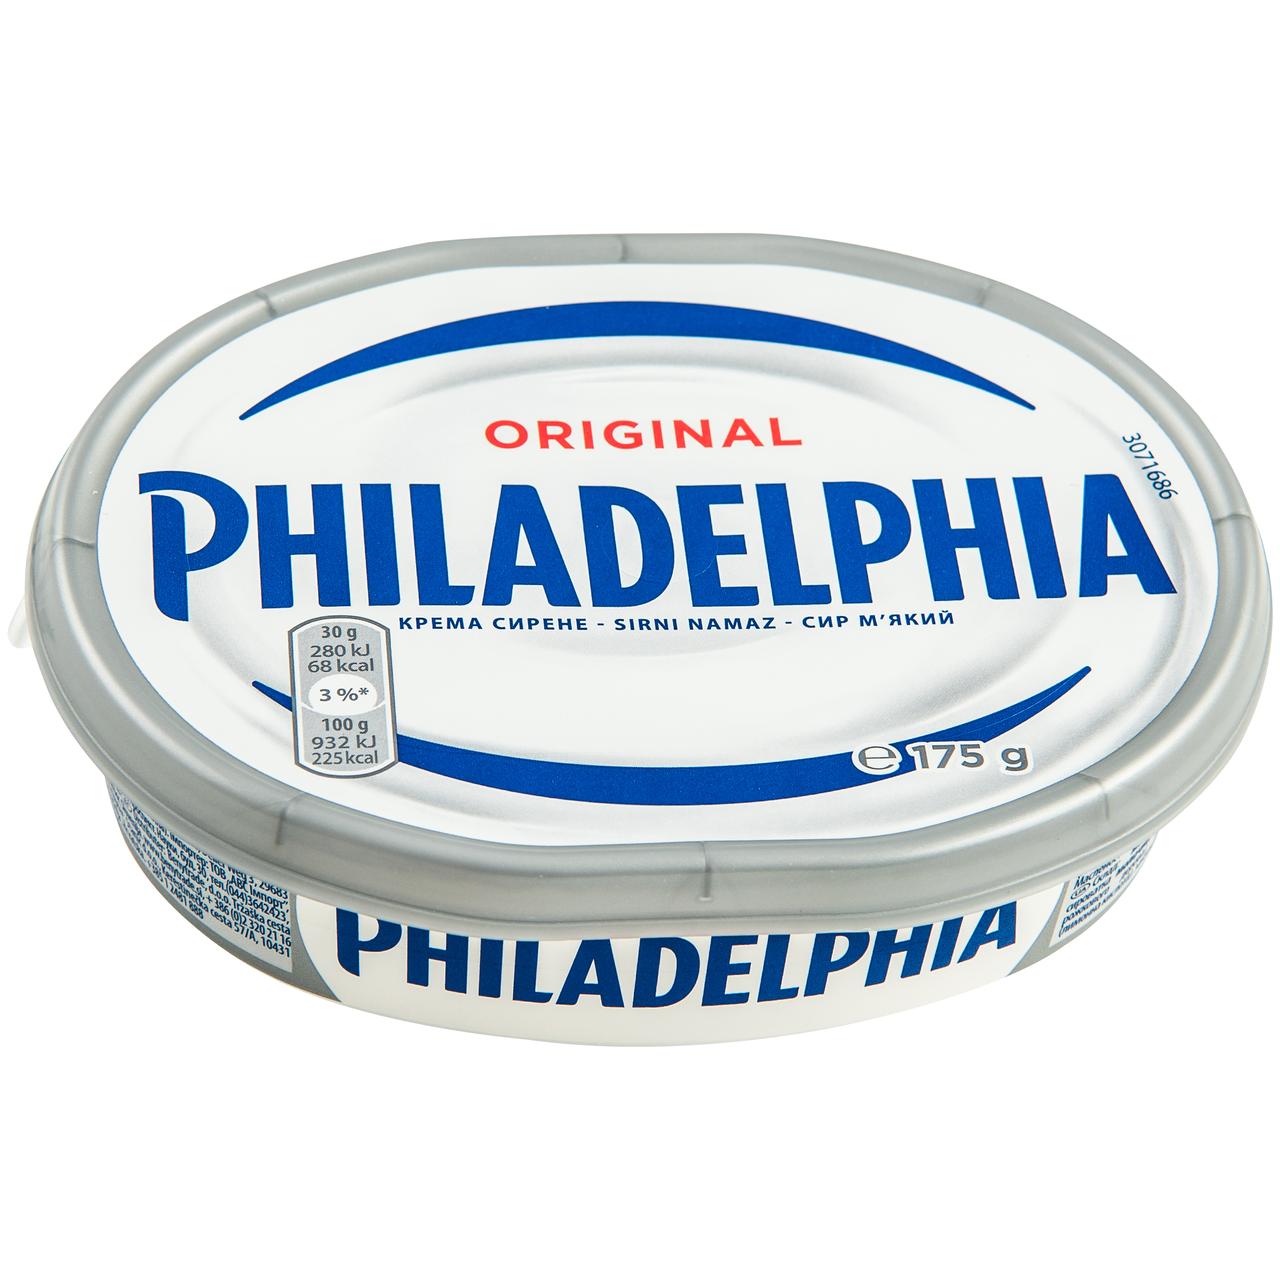 Сир Philadelphia Original м`який пастеризований 61% 175г